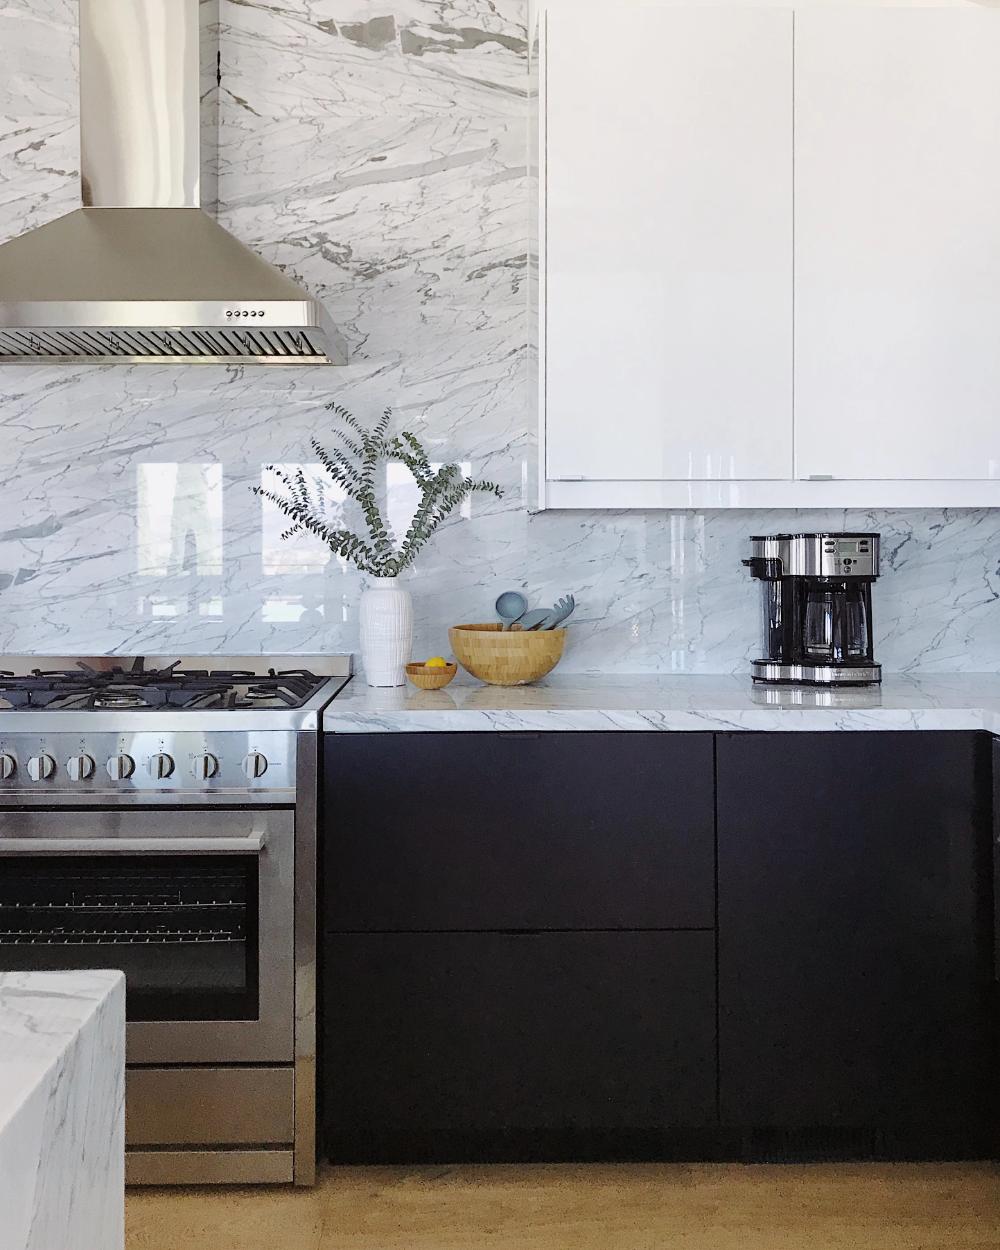 Download Wallpaper White Kitchen With Marble Backsplash